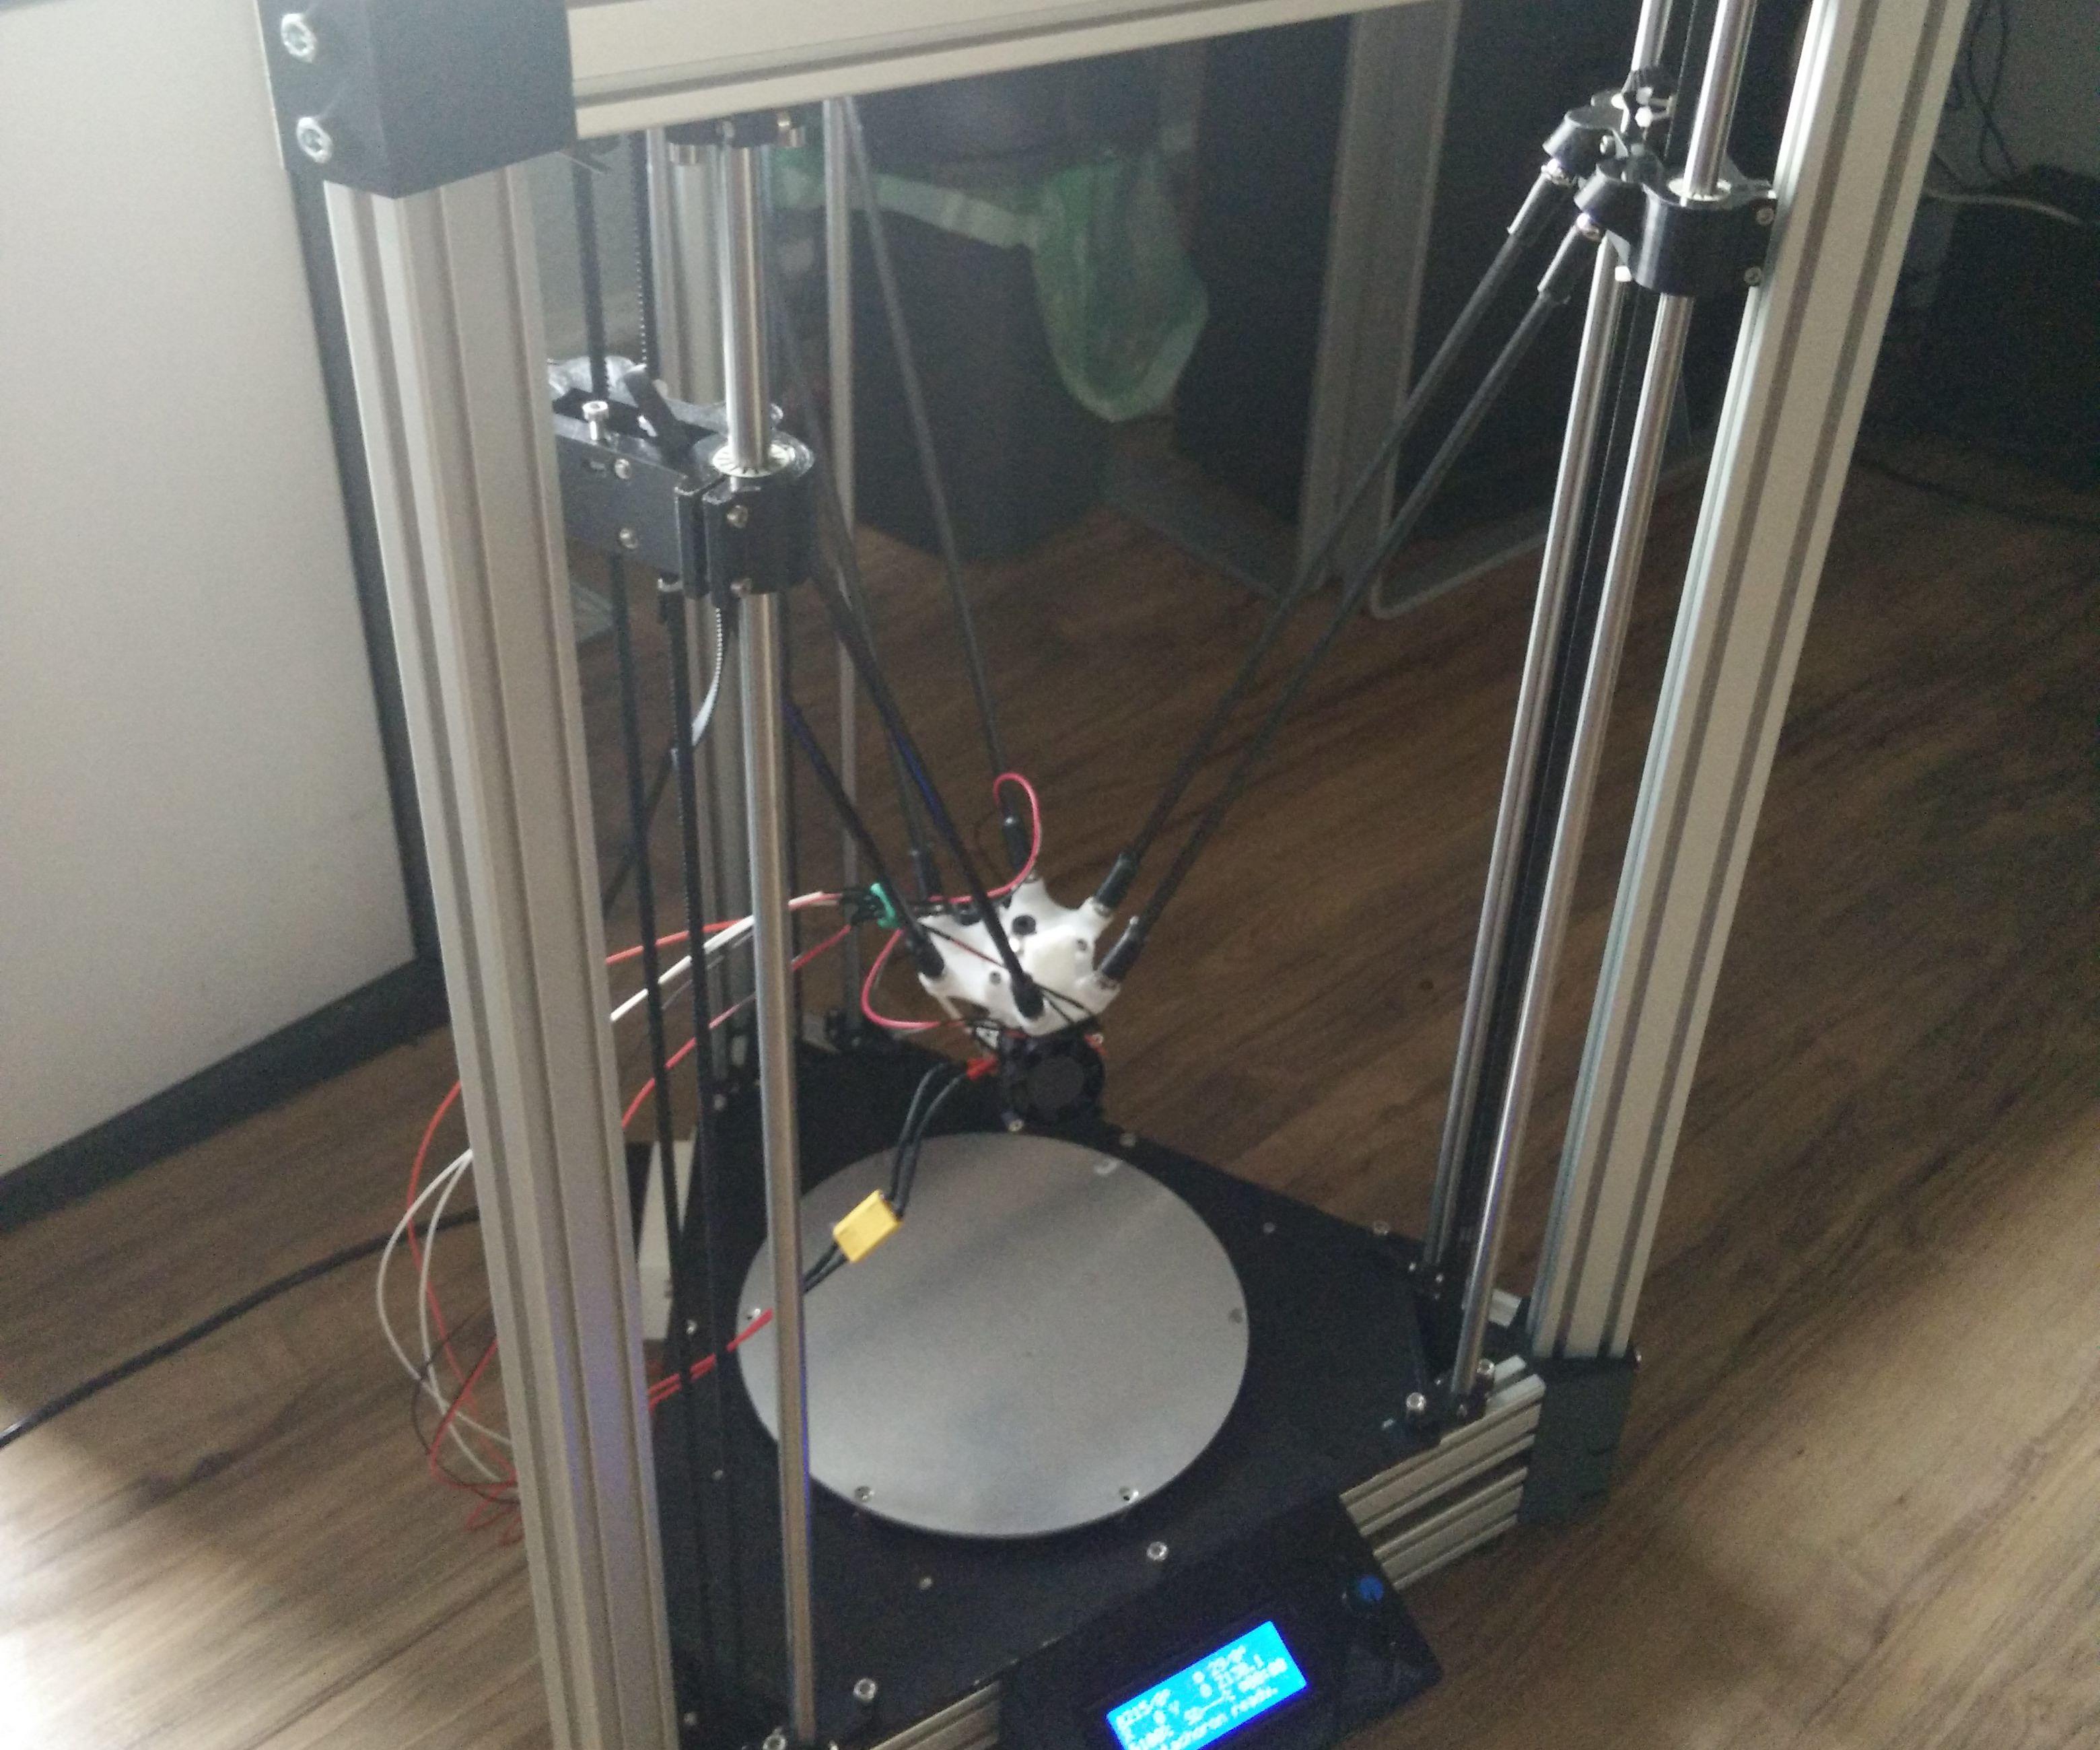 Pentachoron - Delta 3D Printer with Auto Bed Leveling